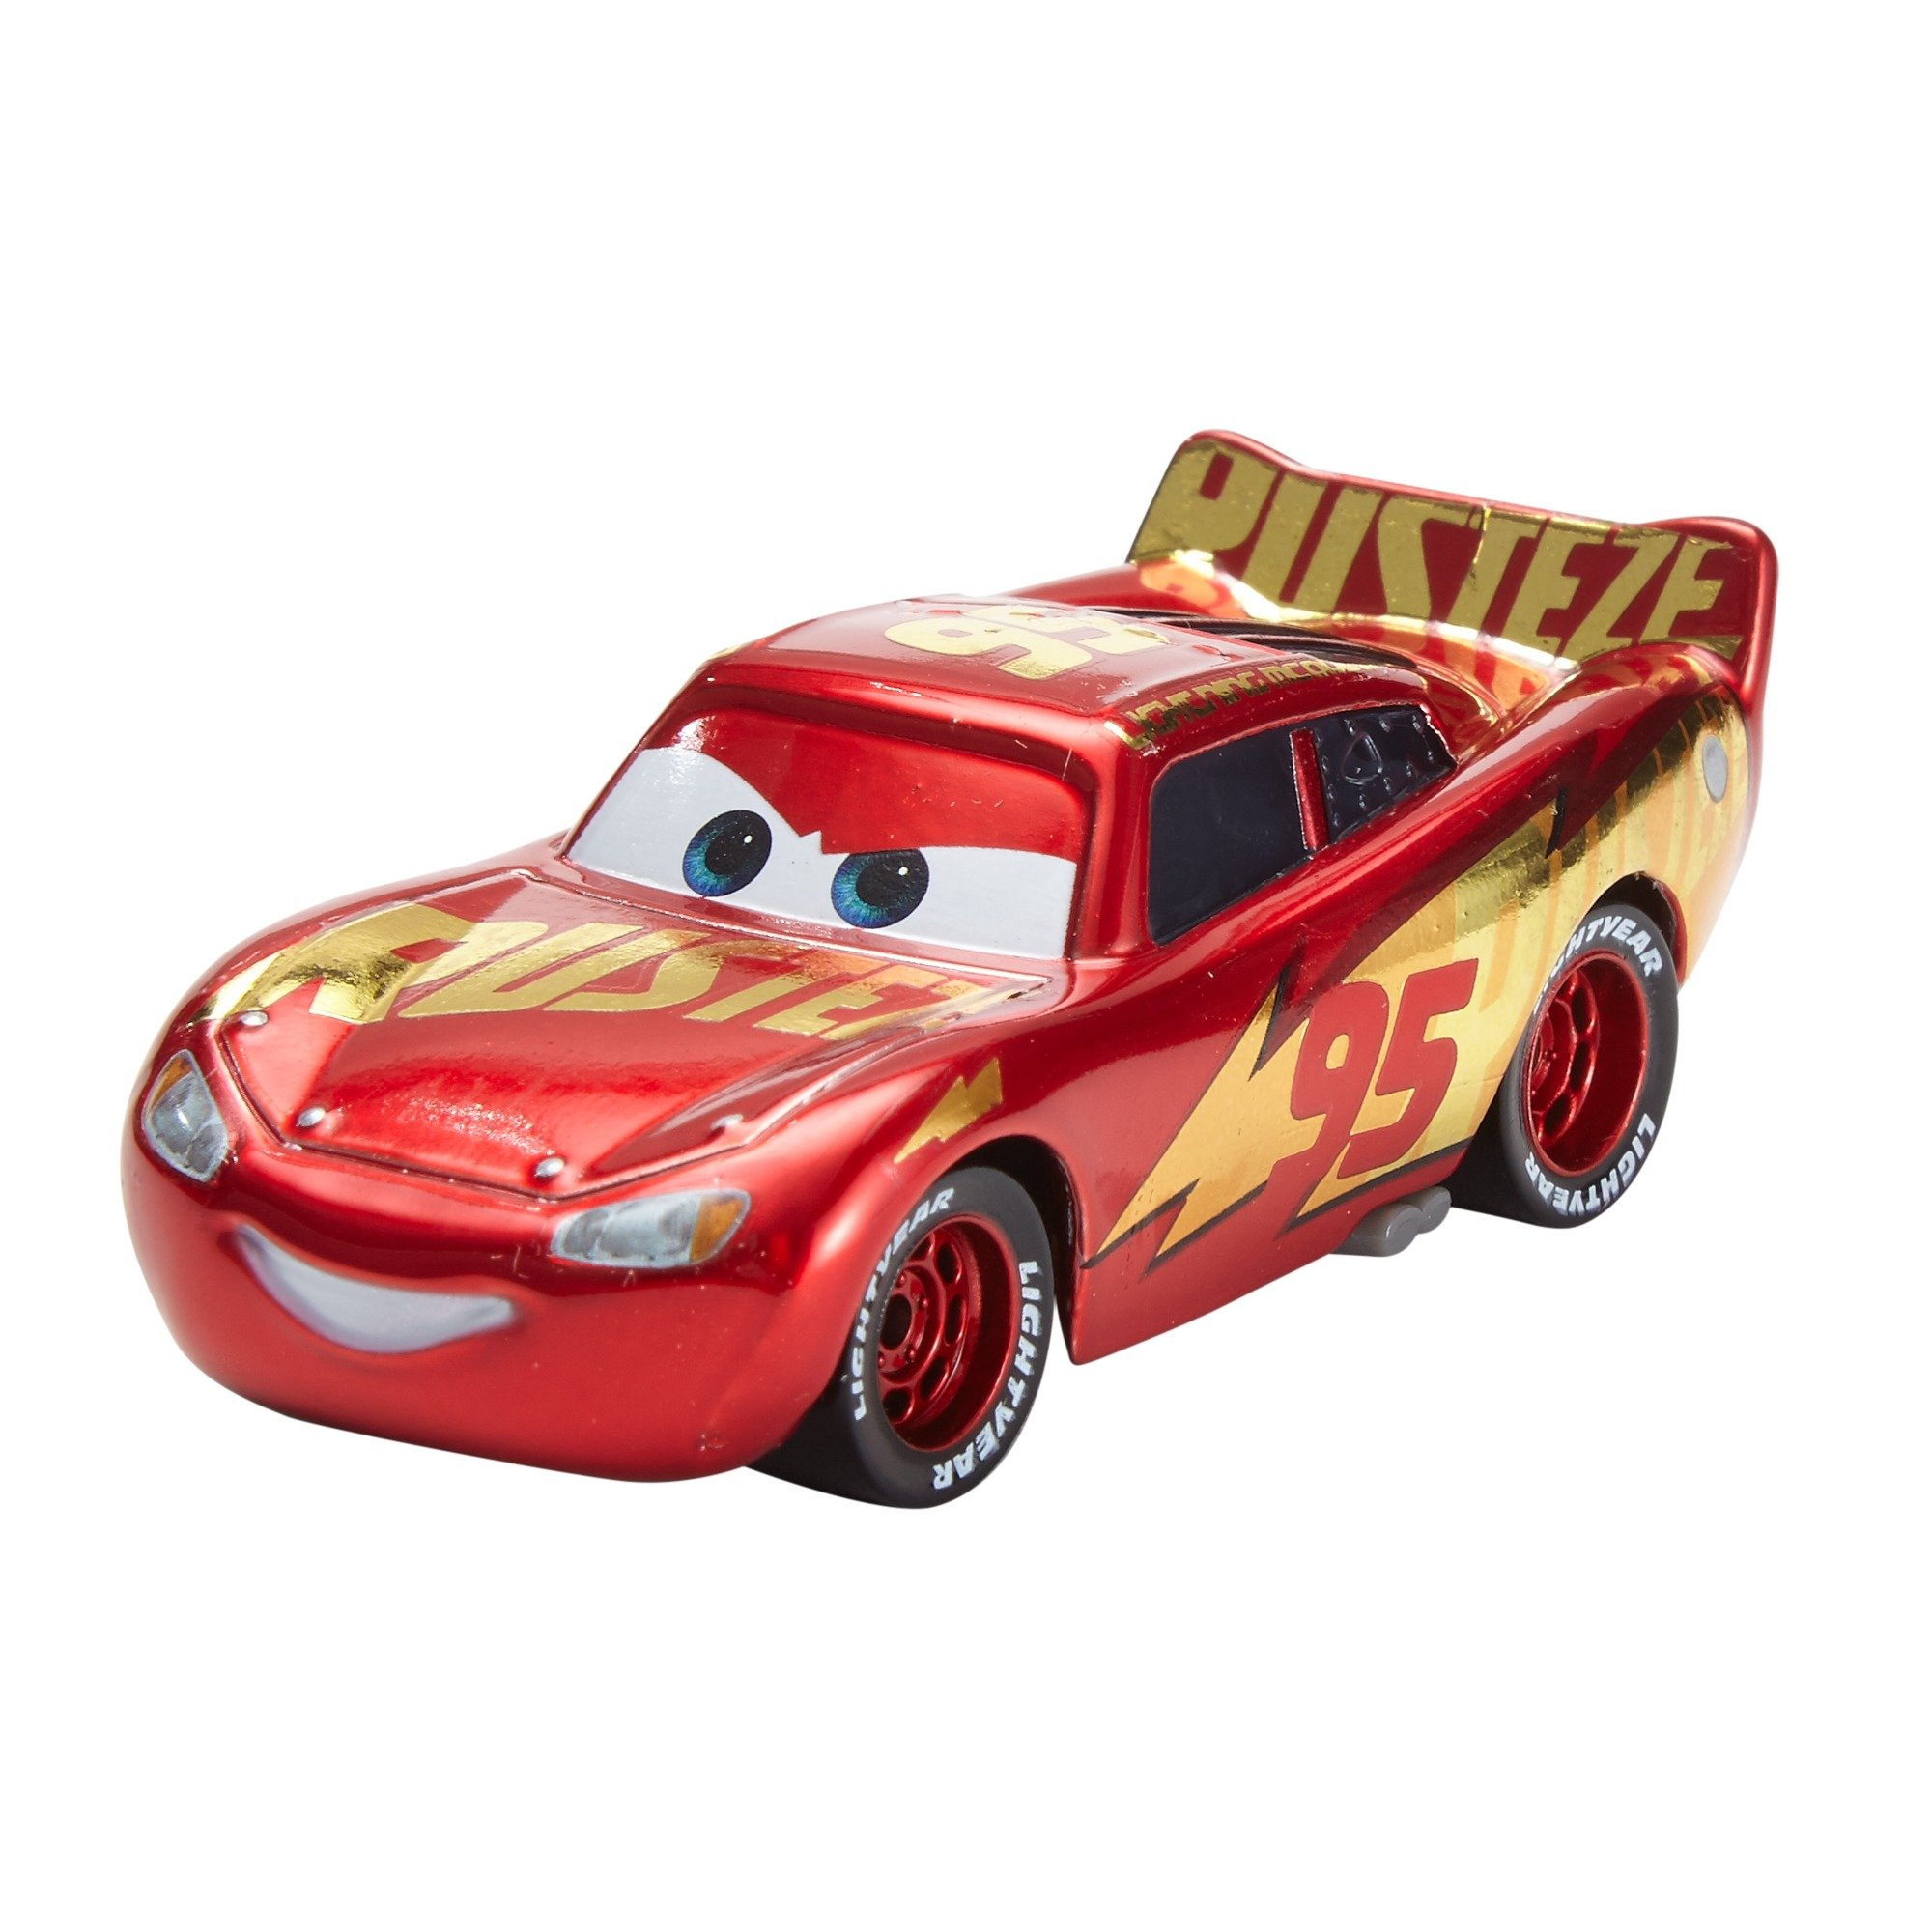 Mattel Disney Cars DXV45 Die-Cast Rust-Eze Racing Center Lightning Mcqueen